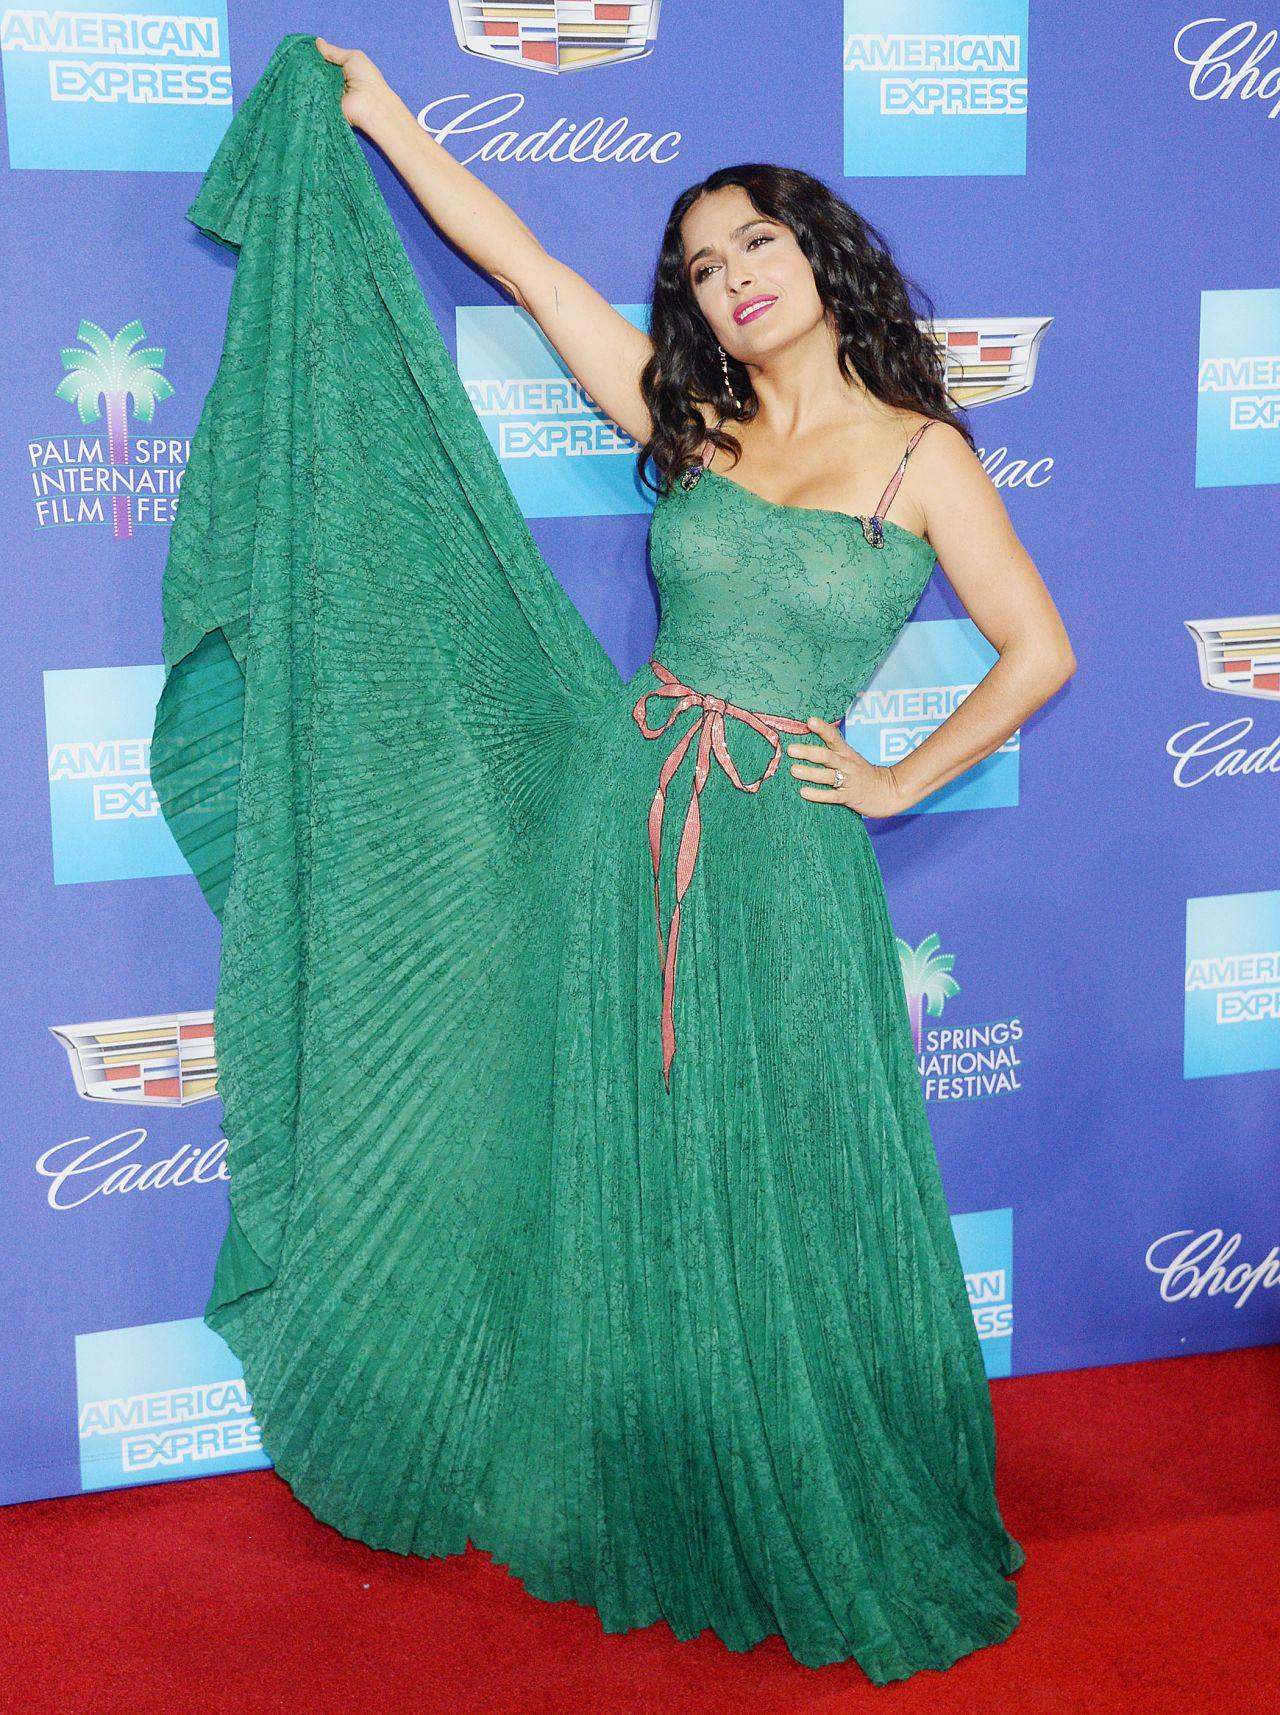 http://celebmafia.com/wp-content/uploads/2018/01/salma-hayek-palm-springs-international-film-festival-awards-13.jpg